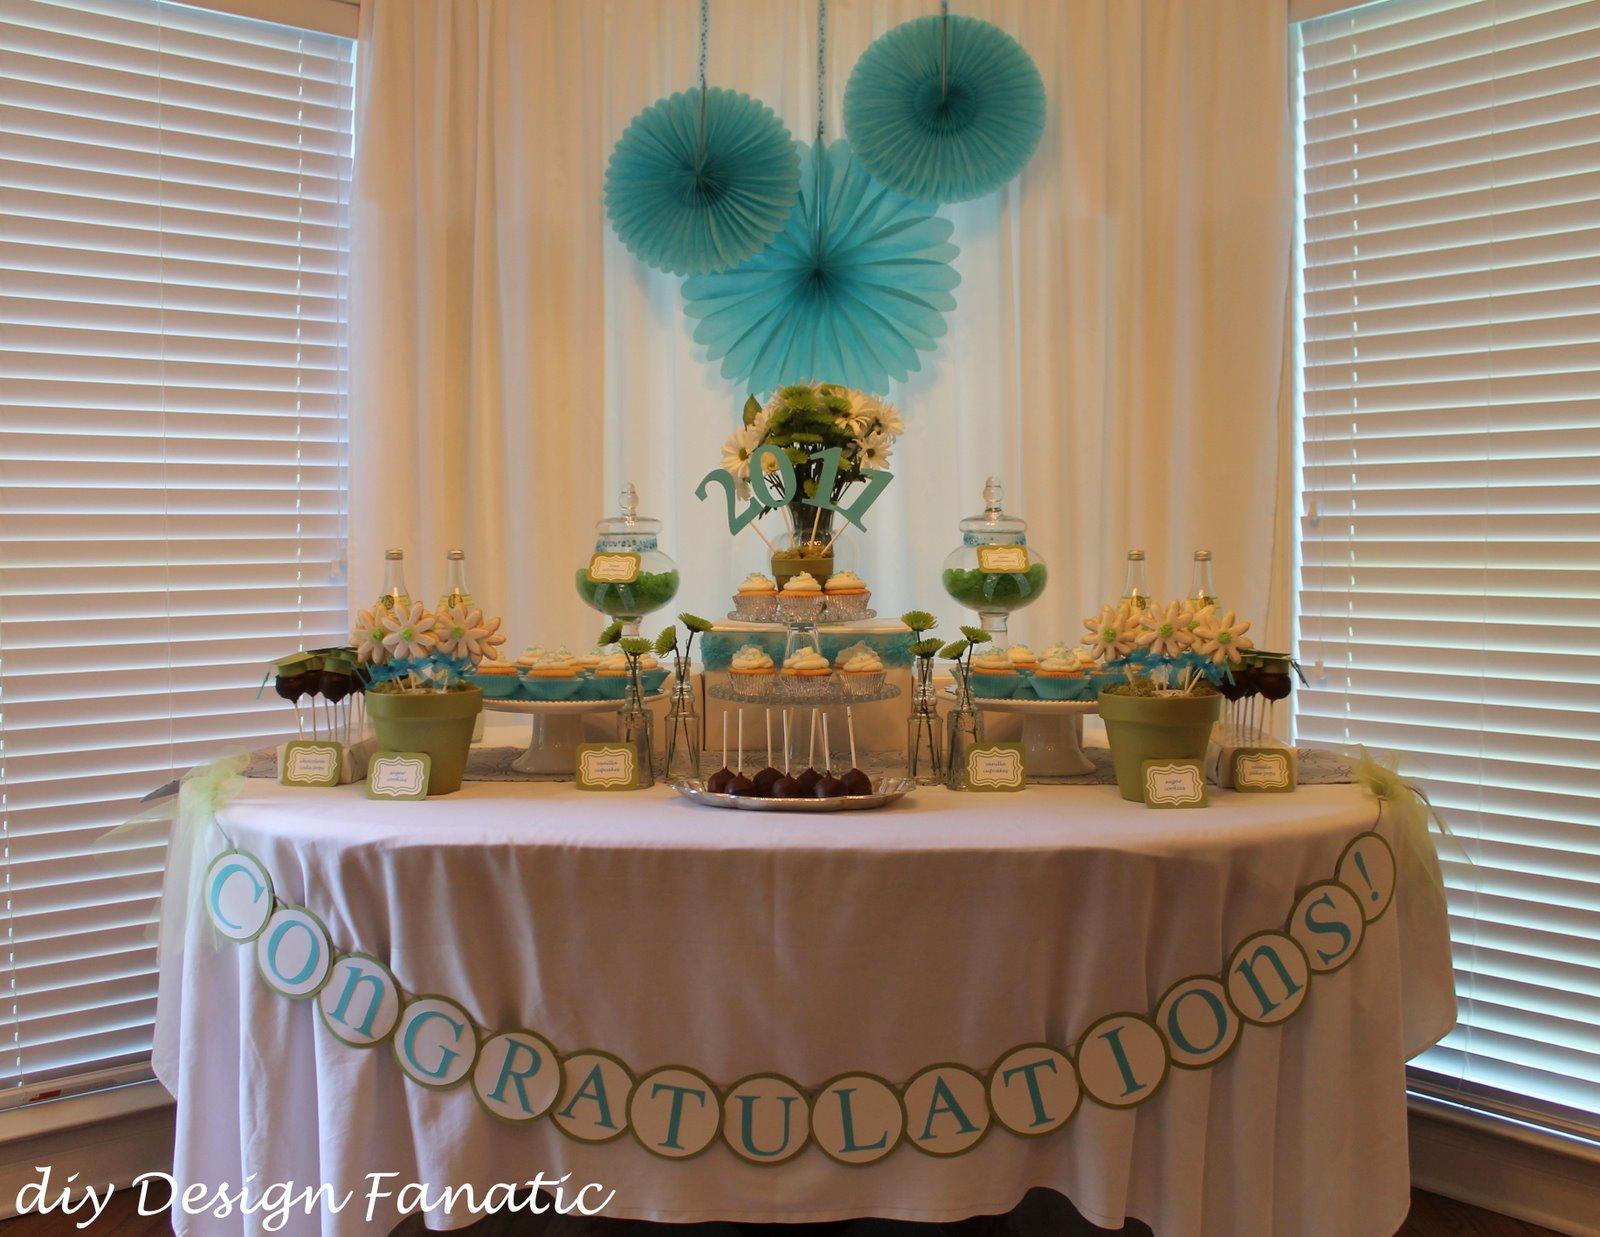 Diy design fanatic graduation dessert table for Homemade table decorations